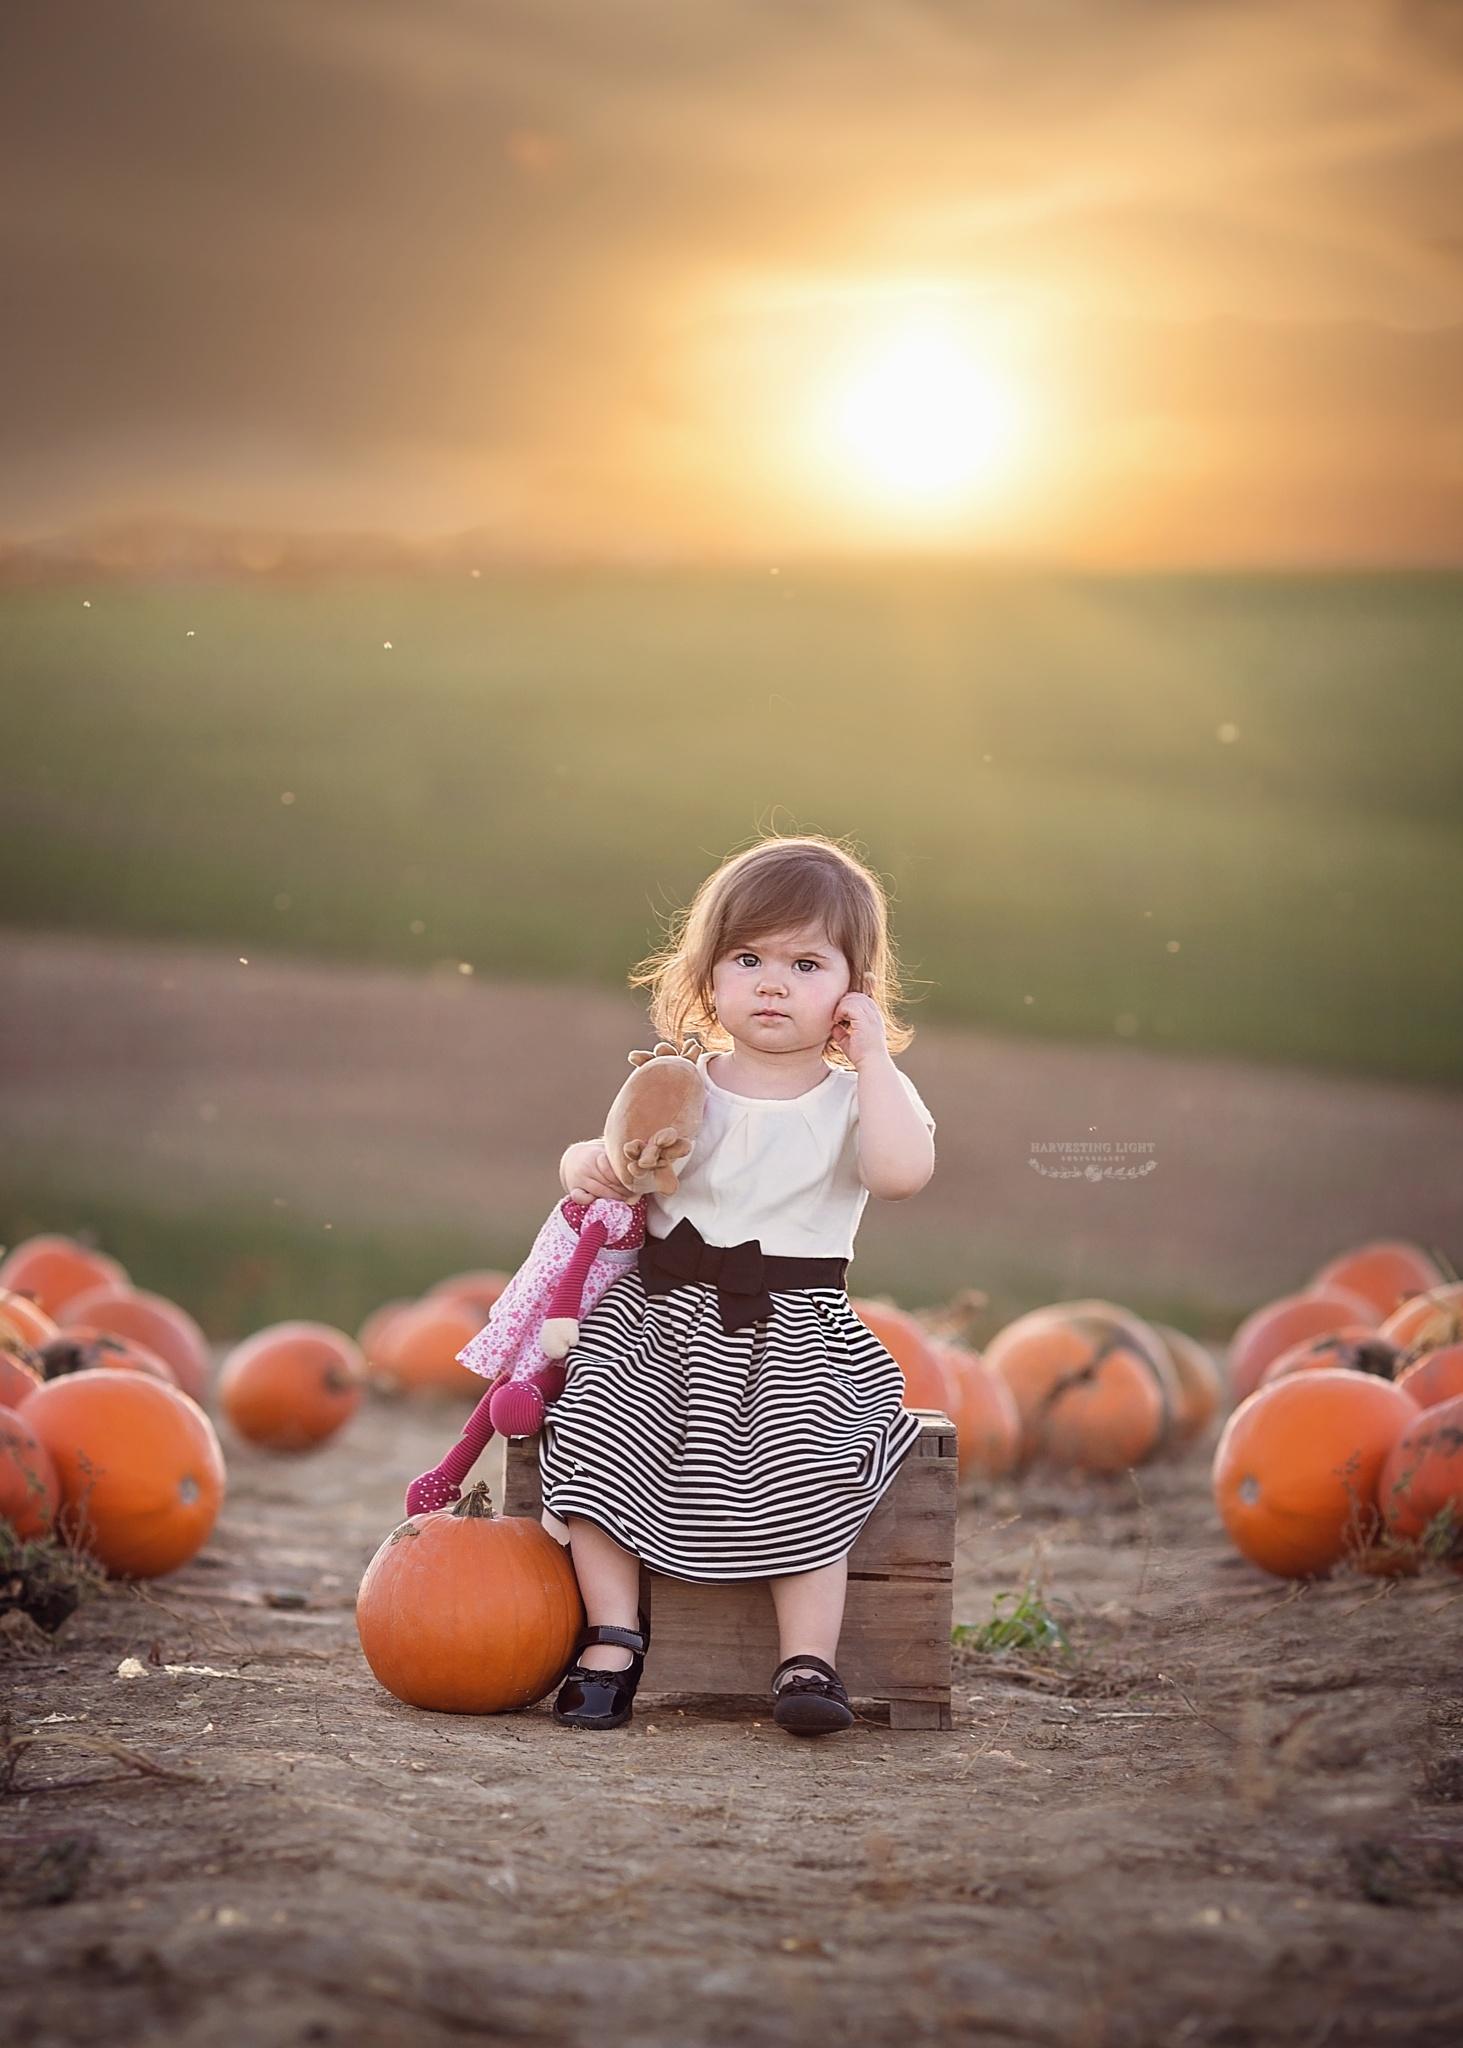 Pumpkin Patch  by HarvestingLight